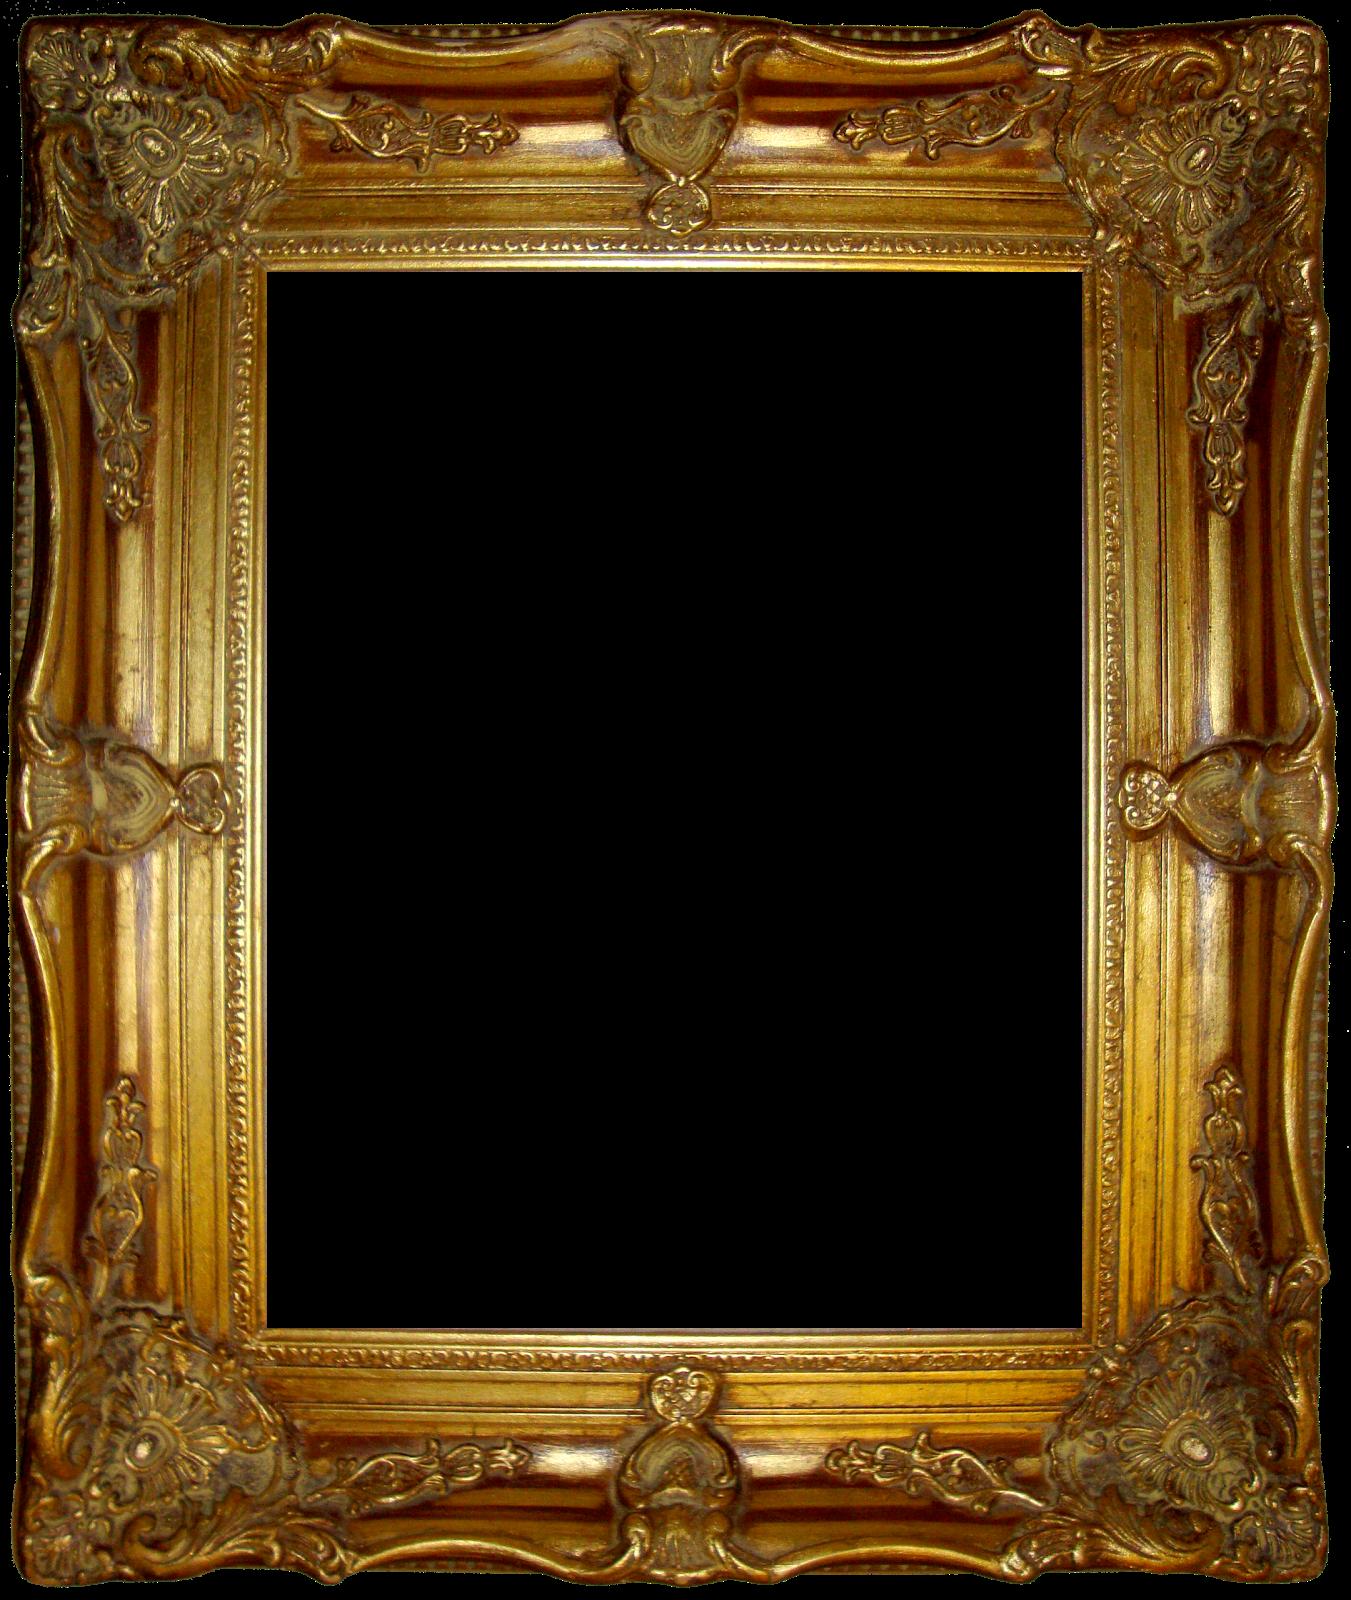 Doodlecraft: Freebie 4: Fancy Vintage Ornate Digital Frames!